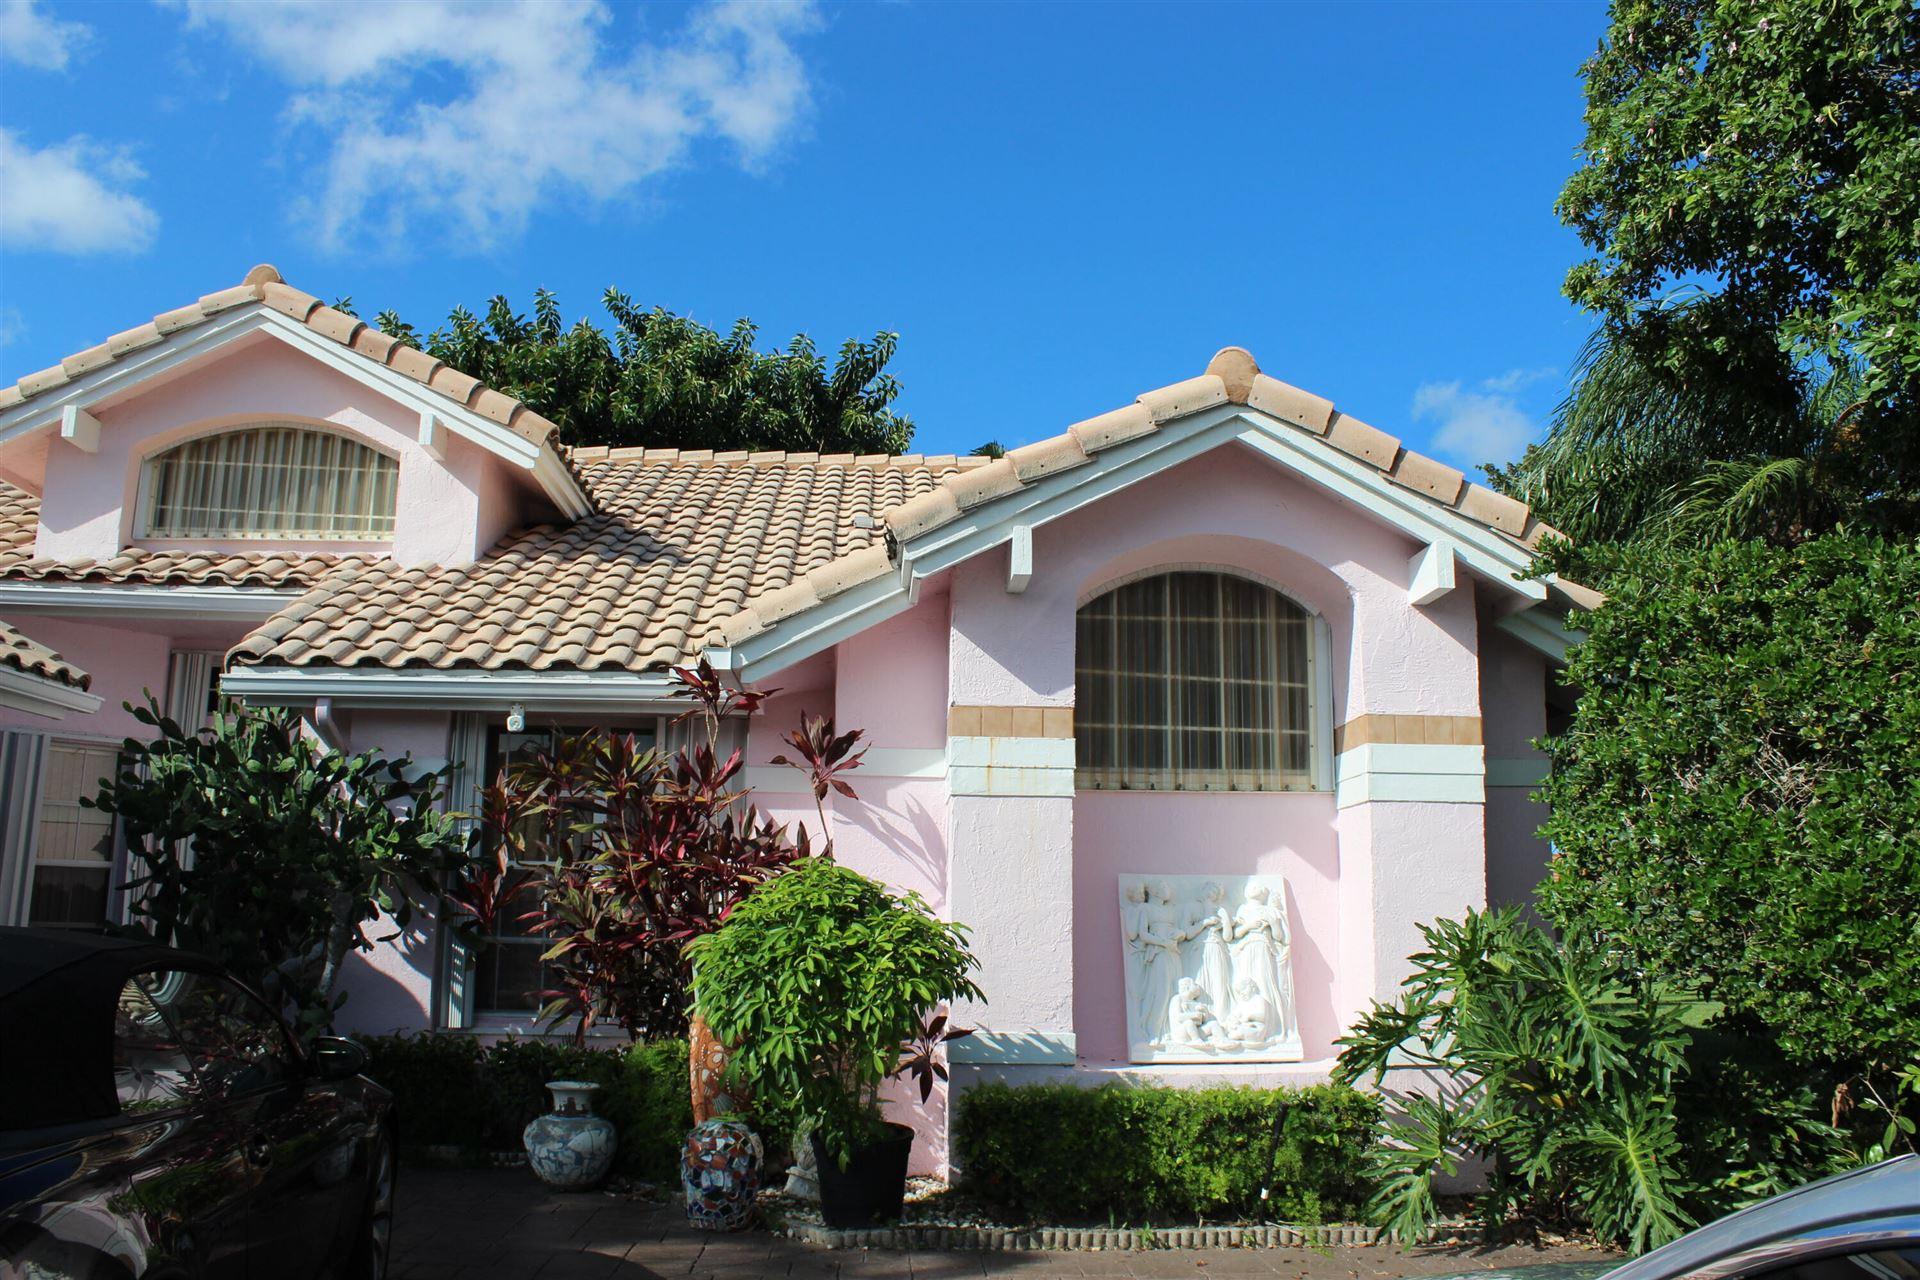 7940 Dorchester Road, Boynton Beach, FL 33437 - #: RX-10746236